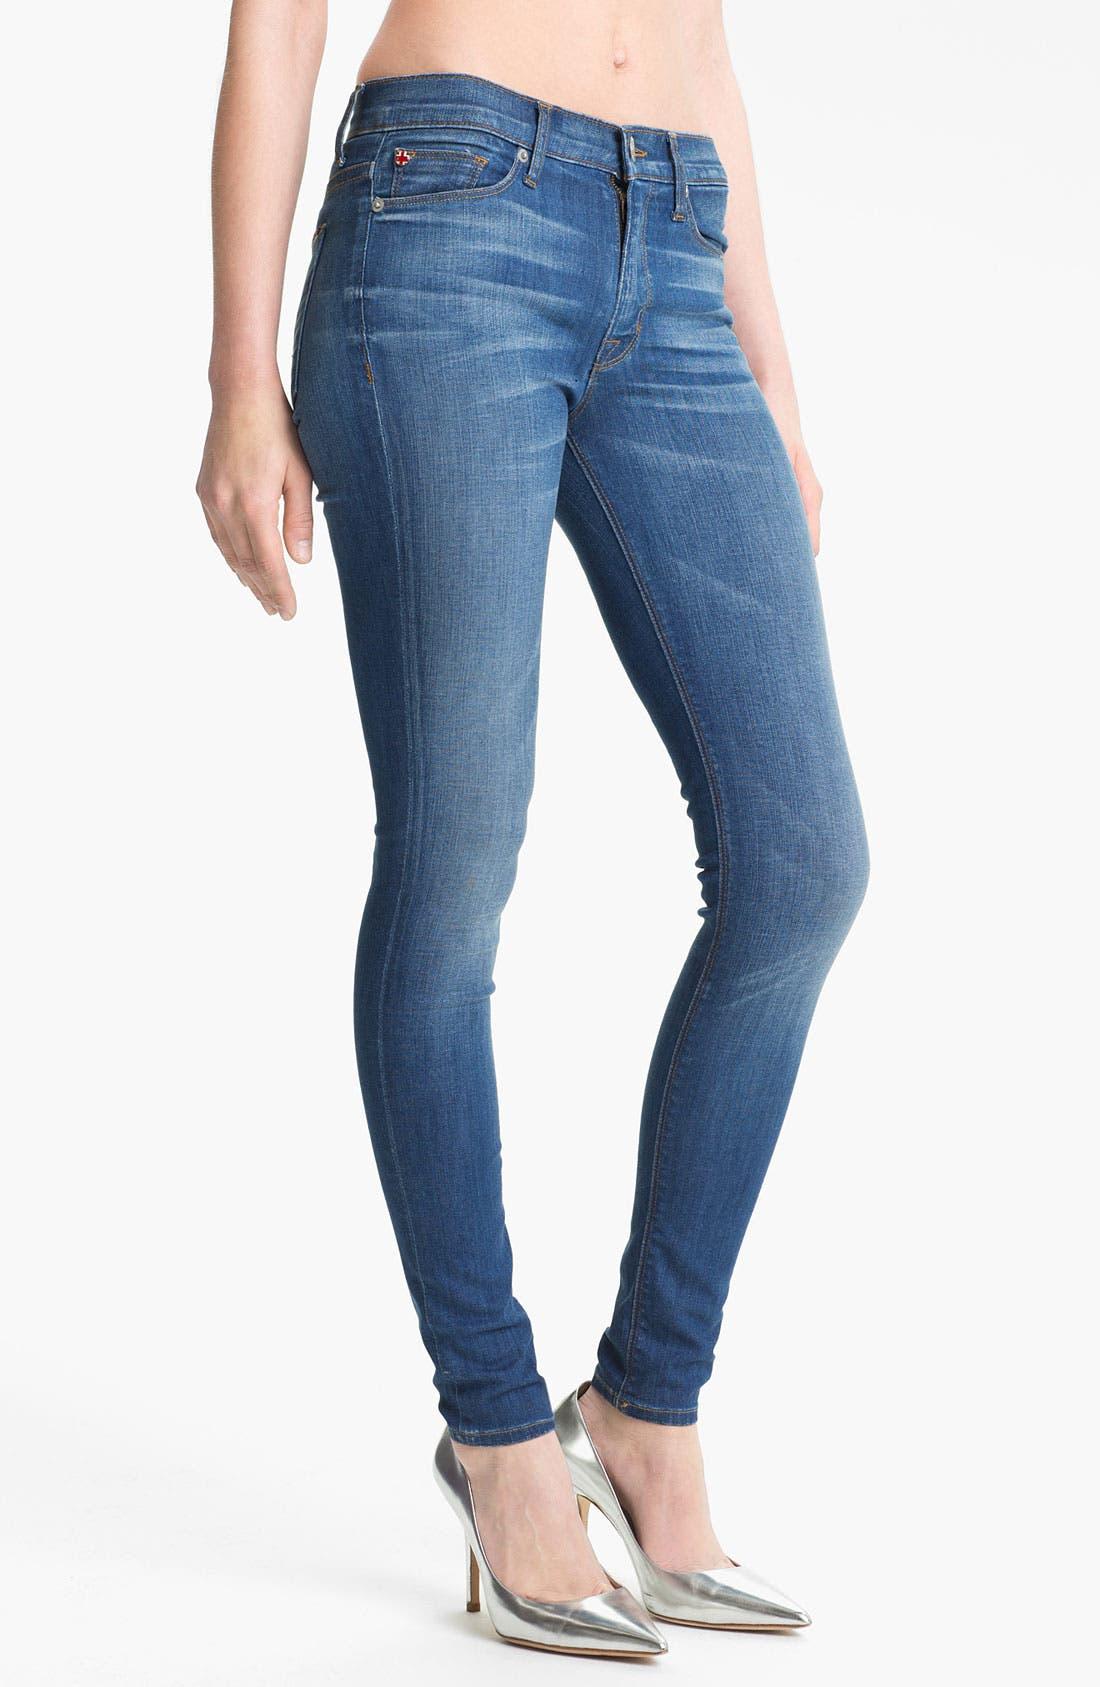 Alternate Image 1 Selected - Hudson Jeans 'Nico' Skinny Stretch Jeans (Morrissey)